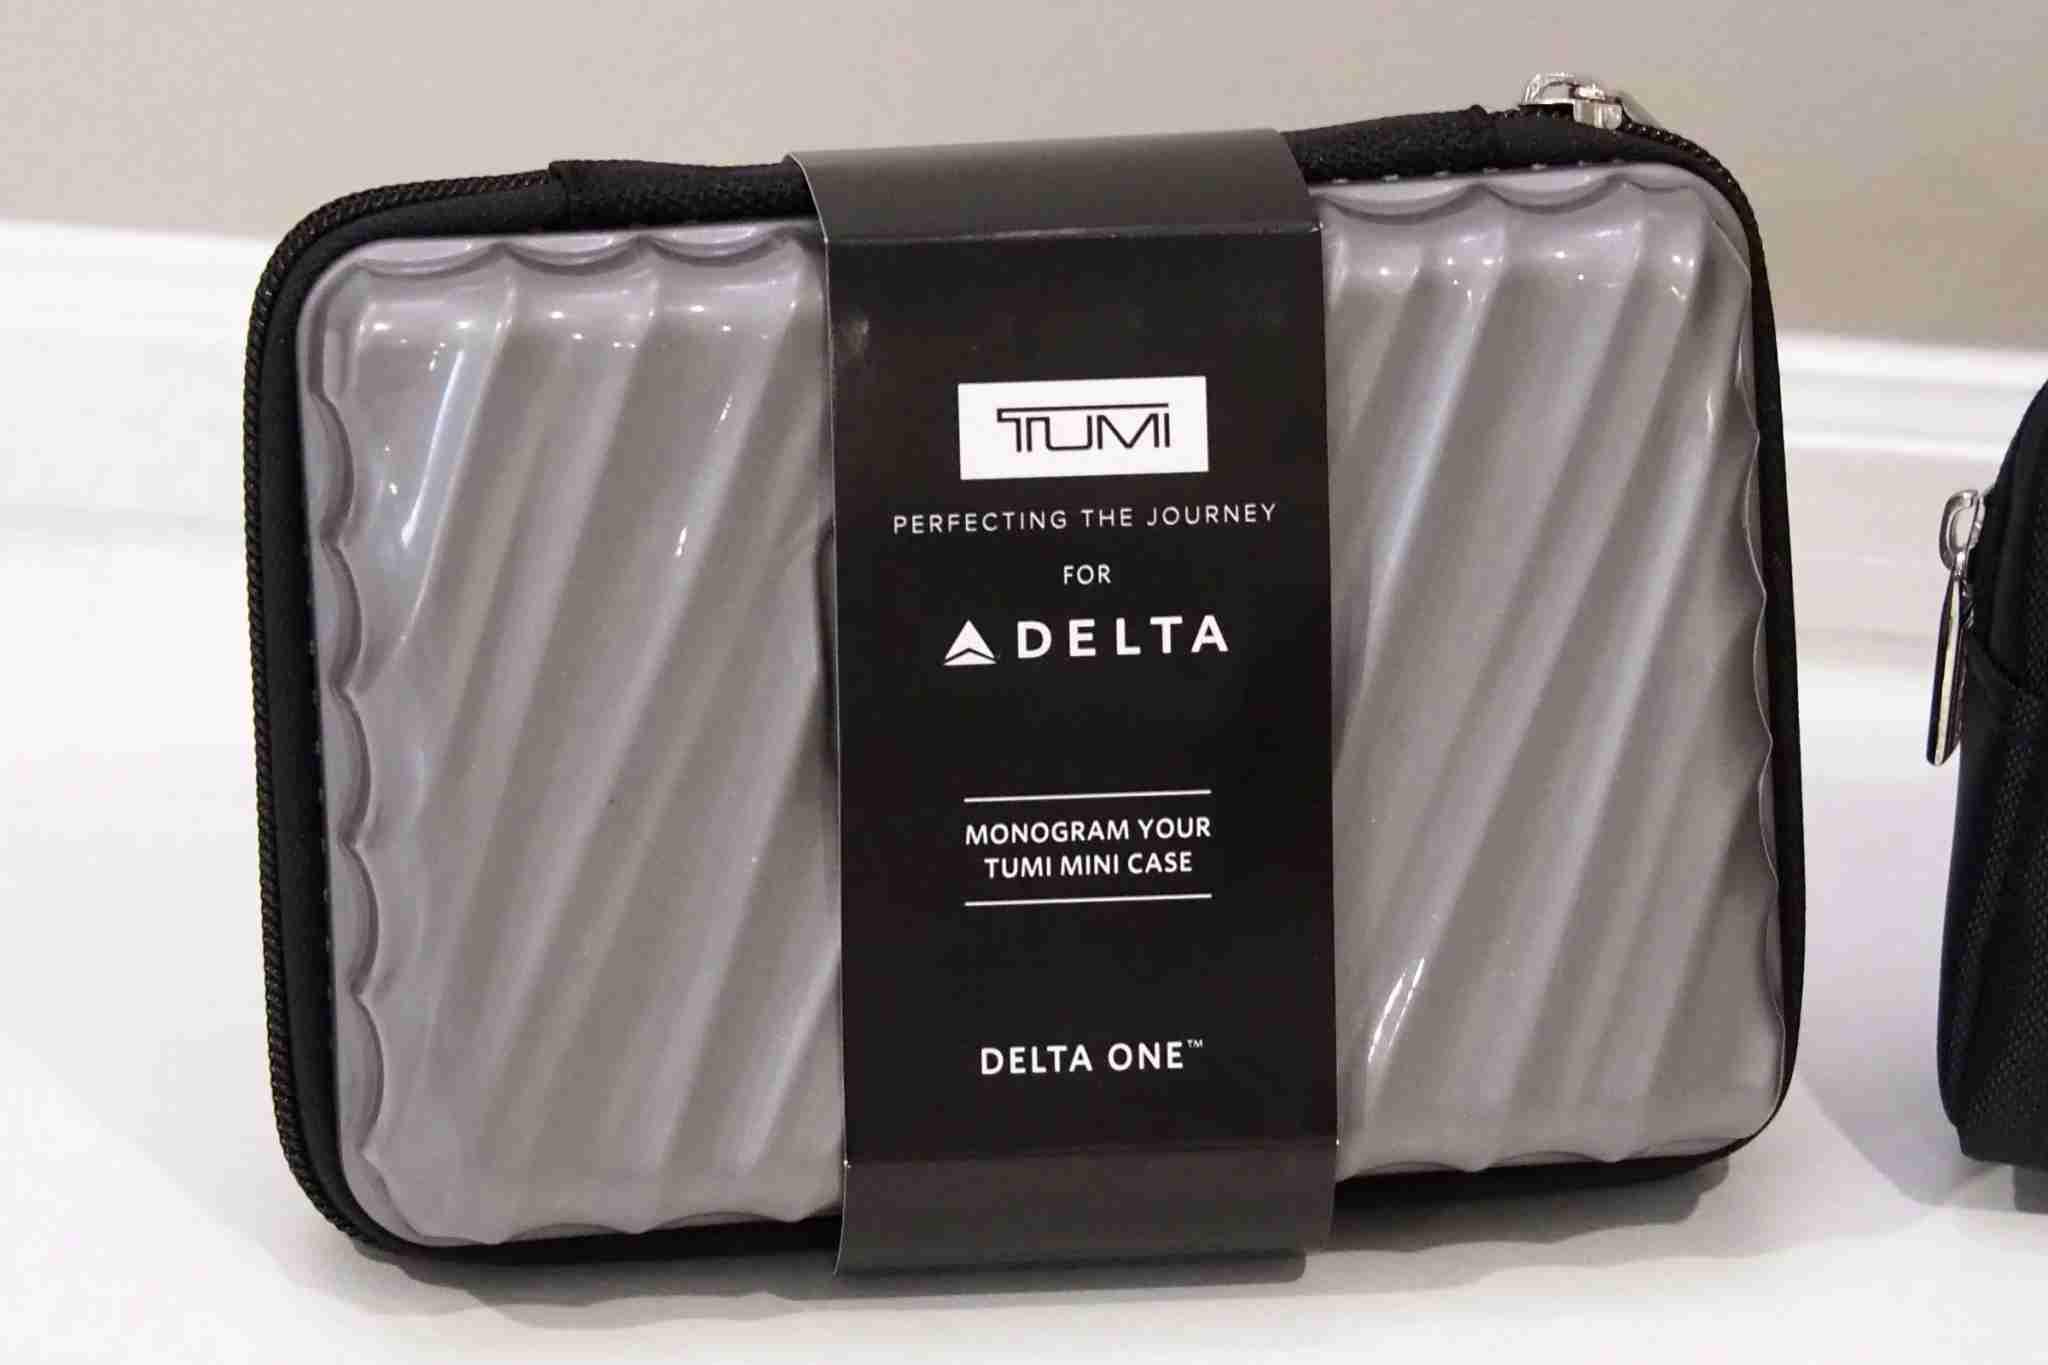 Delta One Premium Select Amenity Kits